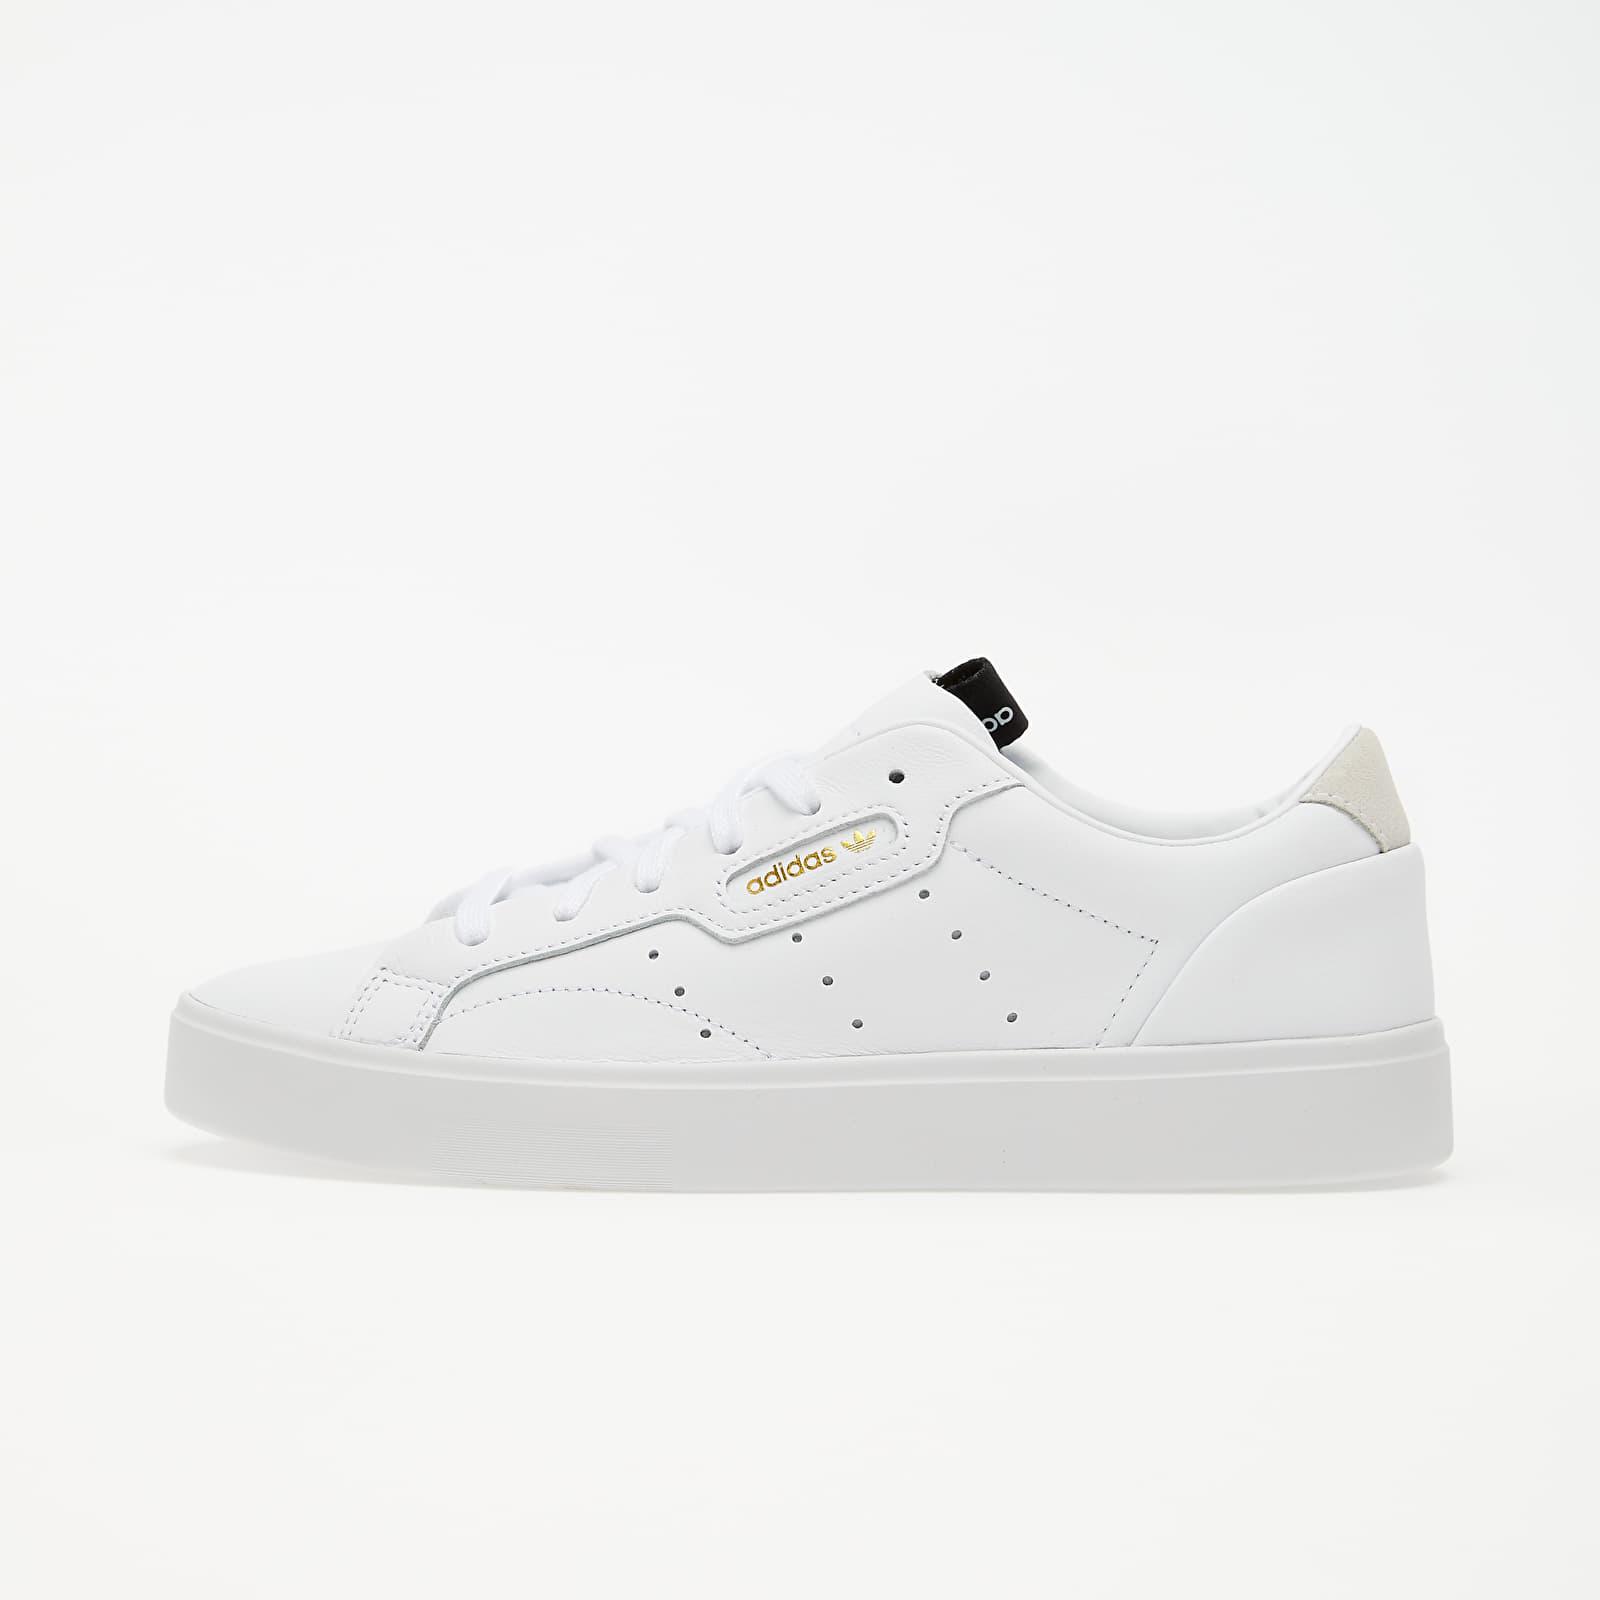 Dámské tenisky a boty adidas Sleek W Ftw White/ Ftw White/ Crystal White